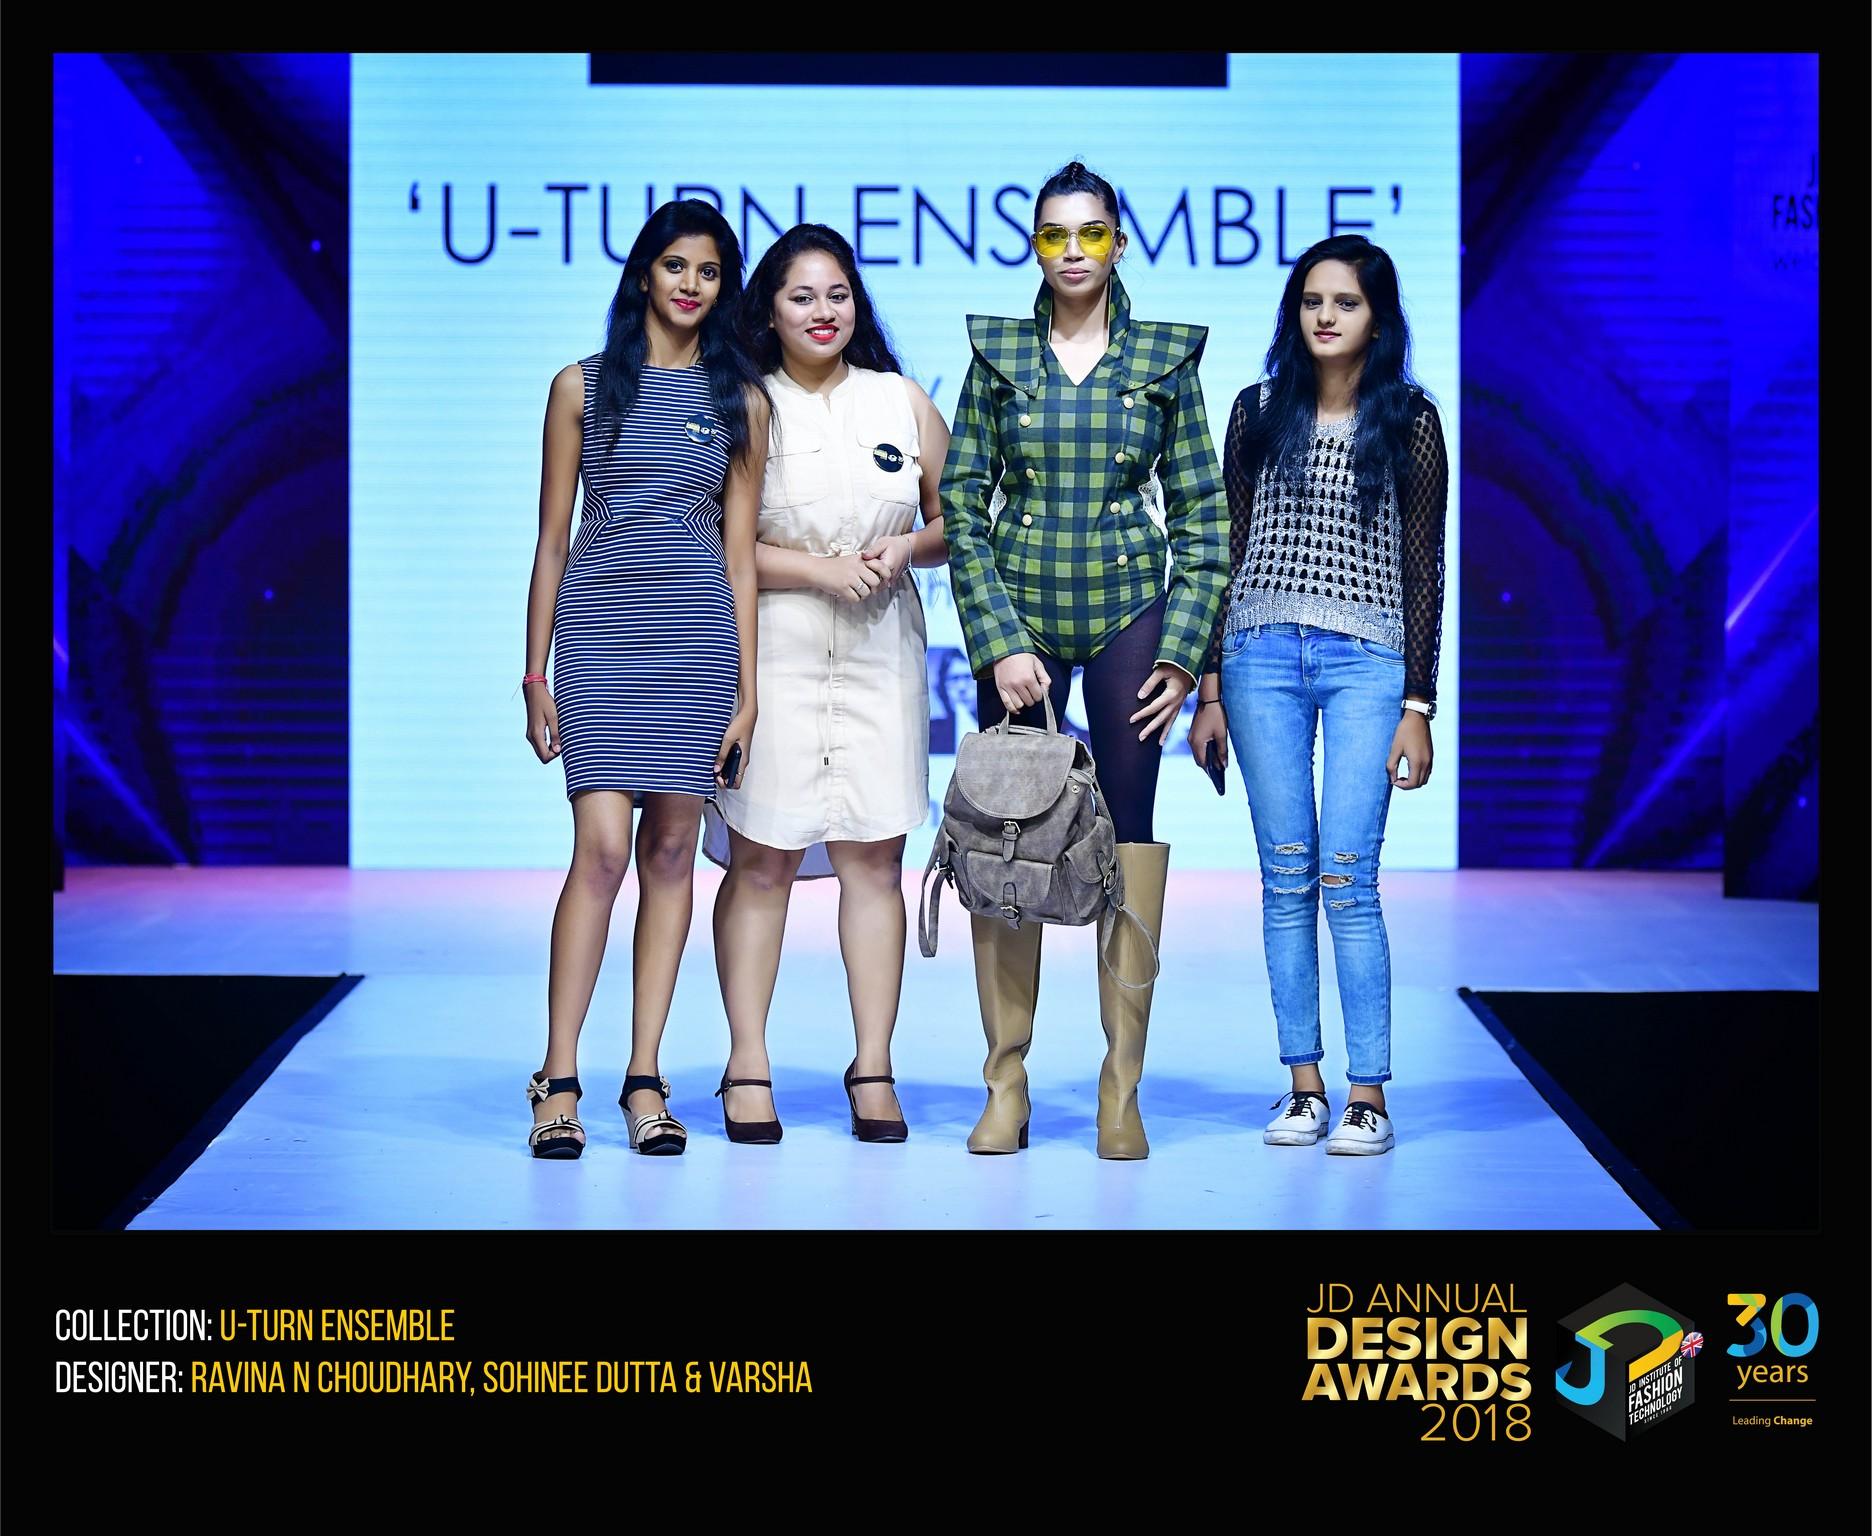 The U-turn ensemble – Change – JD Annual Design Awards 2018 | Designer: Sohinee, Ravina and Varsha | Photography : Jerin Nath (@jerin_nath) the u-turn ensemble - U TURN ENSEMBLE 7 - The U-turn ensemble – Change – JD Annual Design Awards 2018